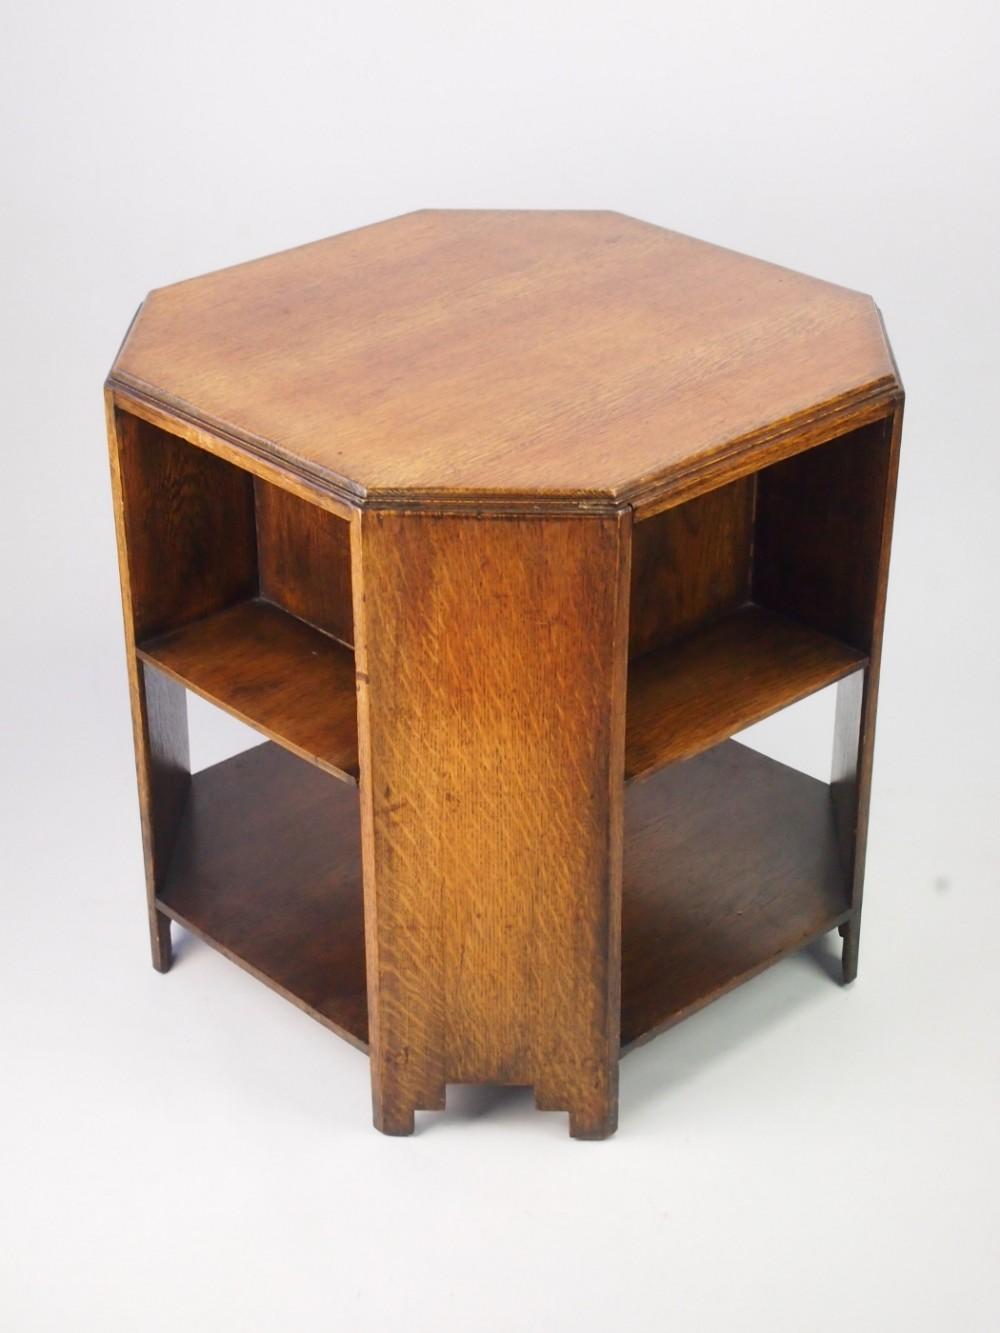 Art deco oak book table coffee table 312396 sellingantiques art deco oak book table coffee table geotapseo Choice Image